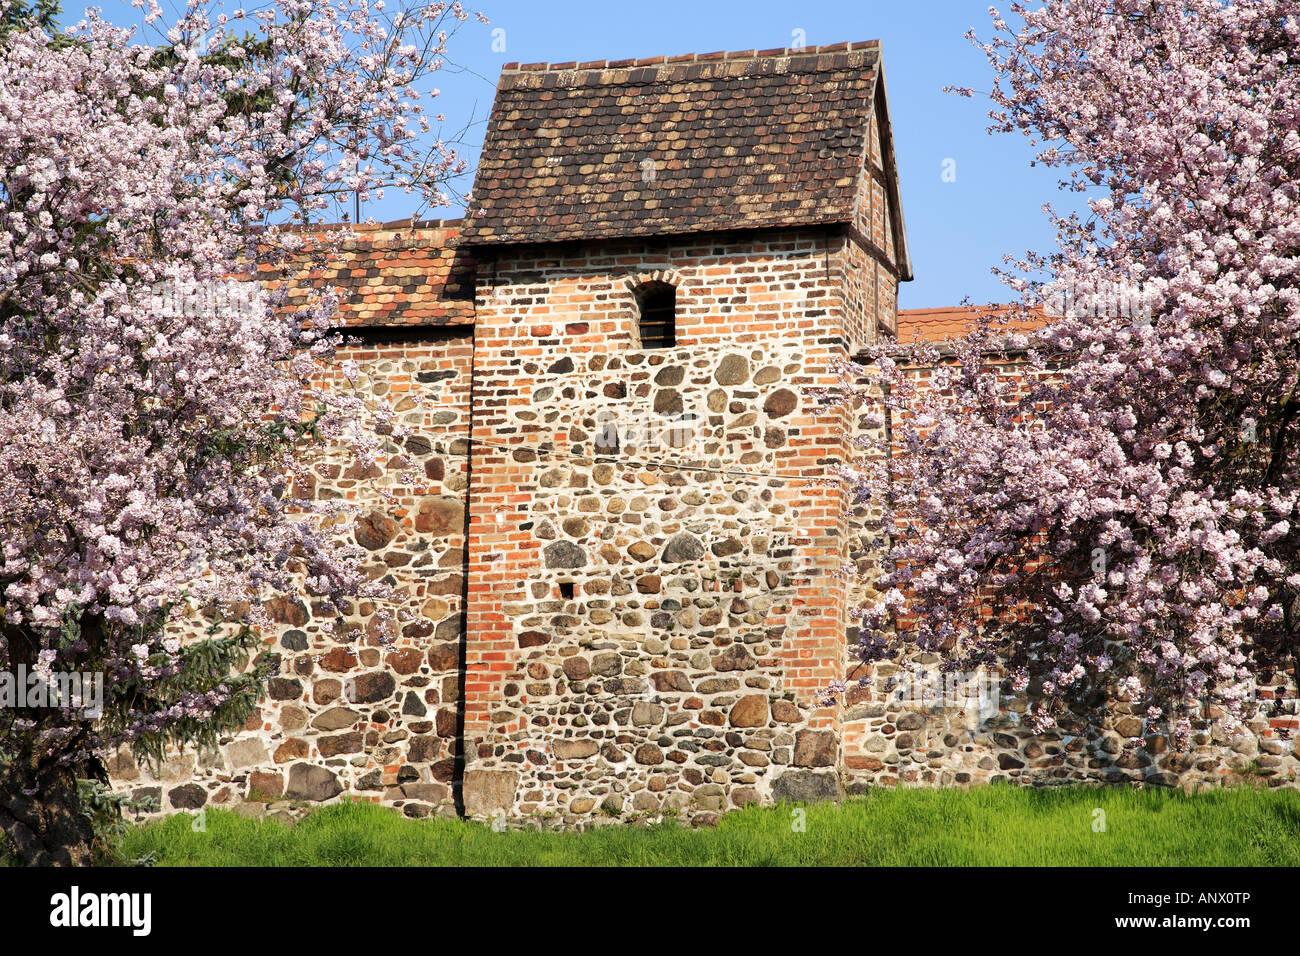 city wall, Germany, Saxony-Anhalt, Zerbst Stock Photo